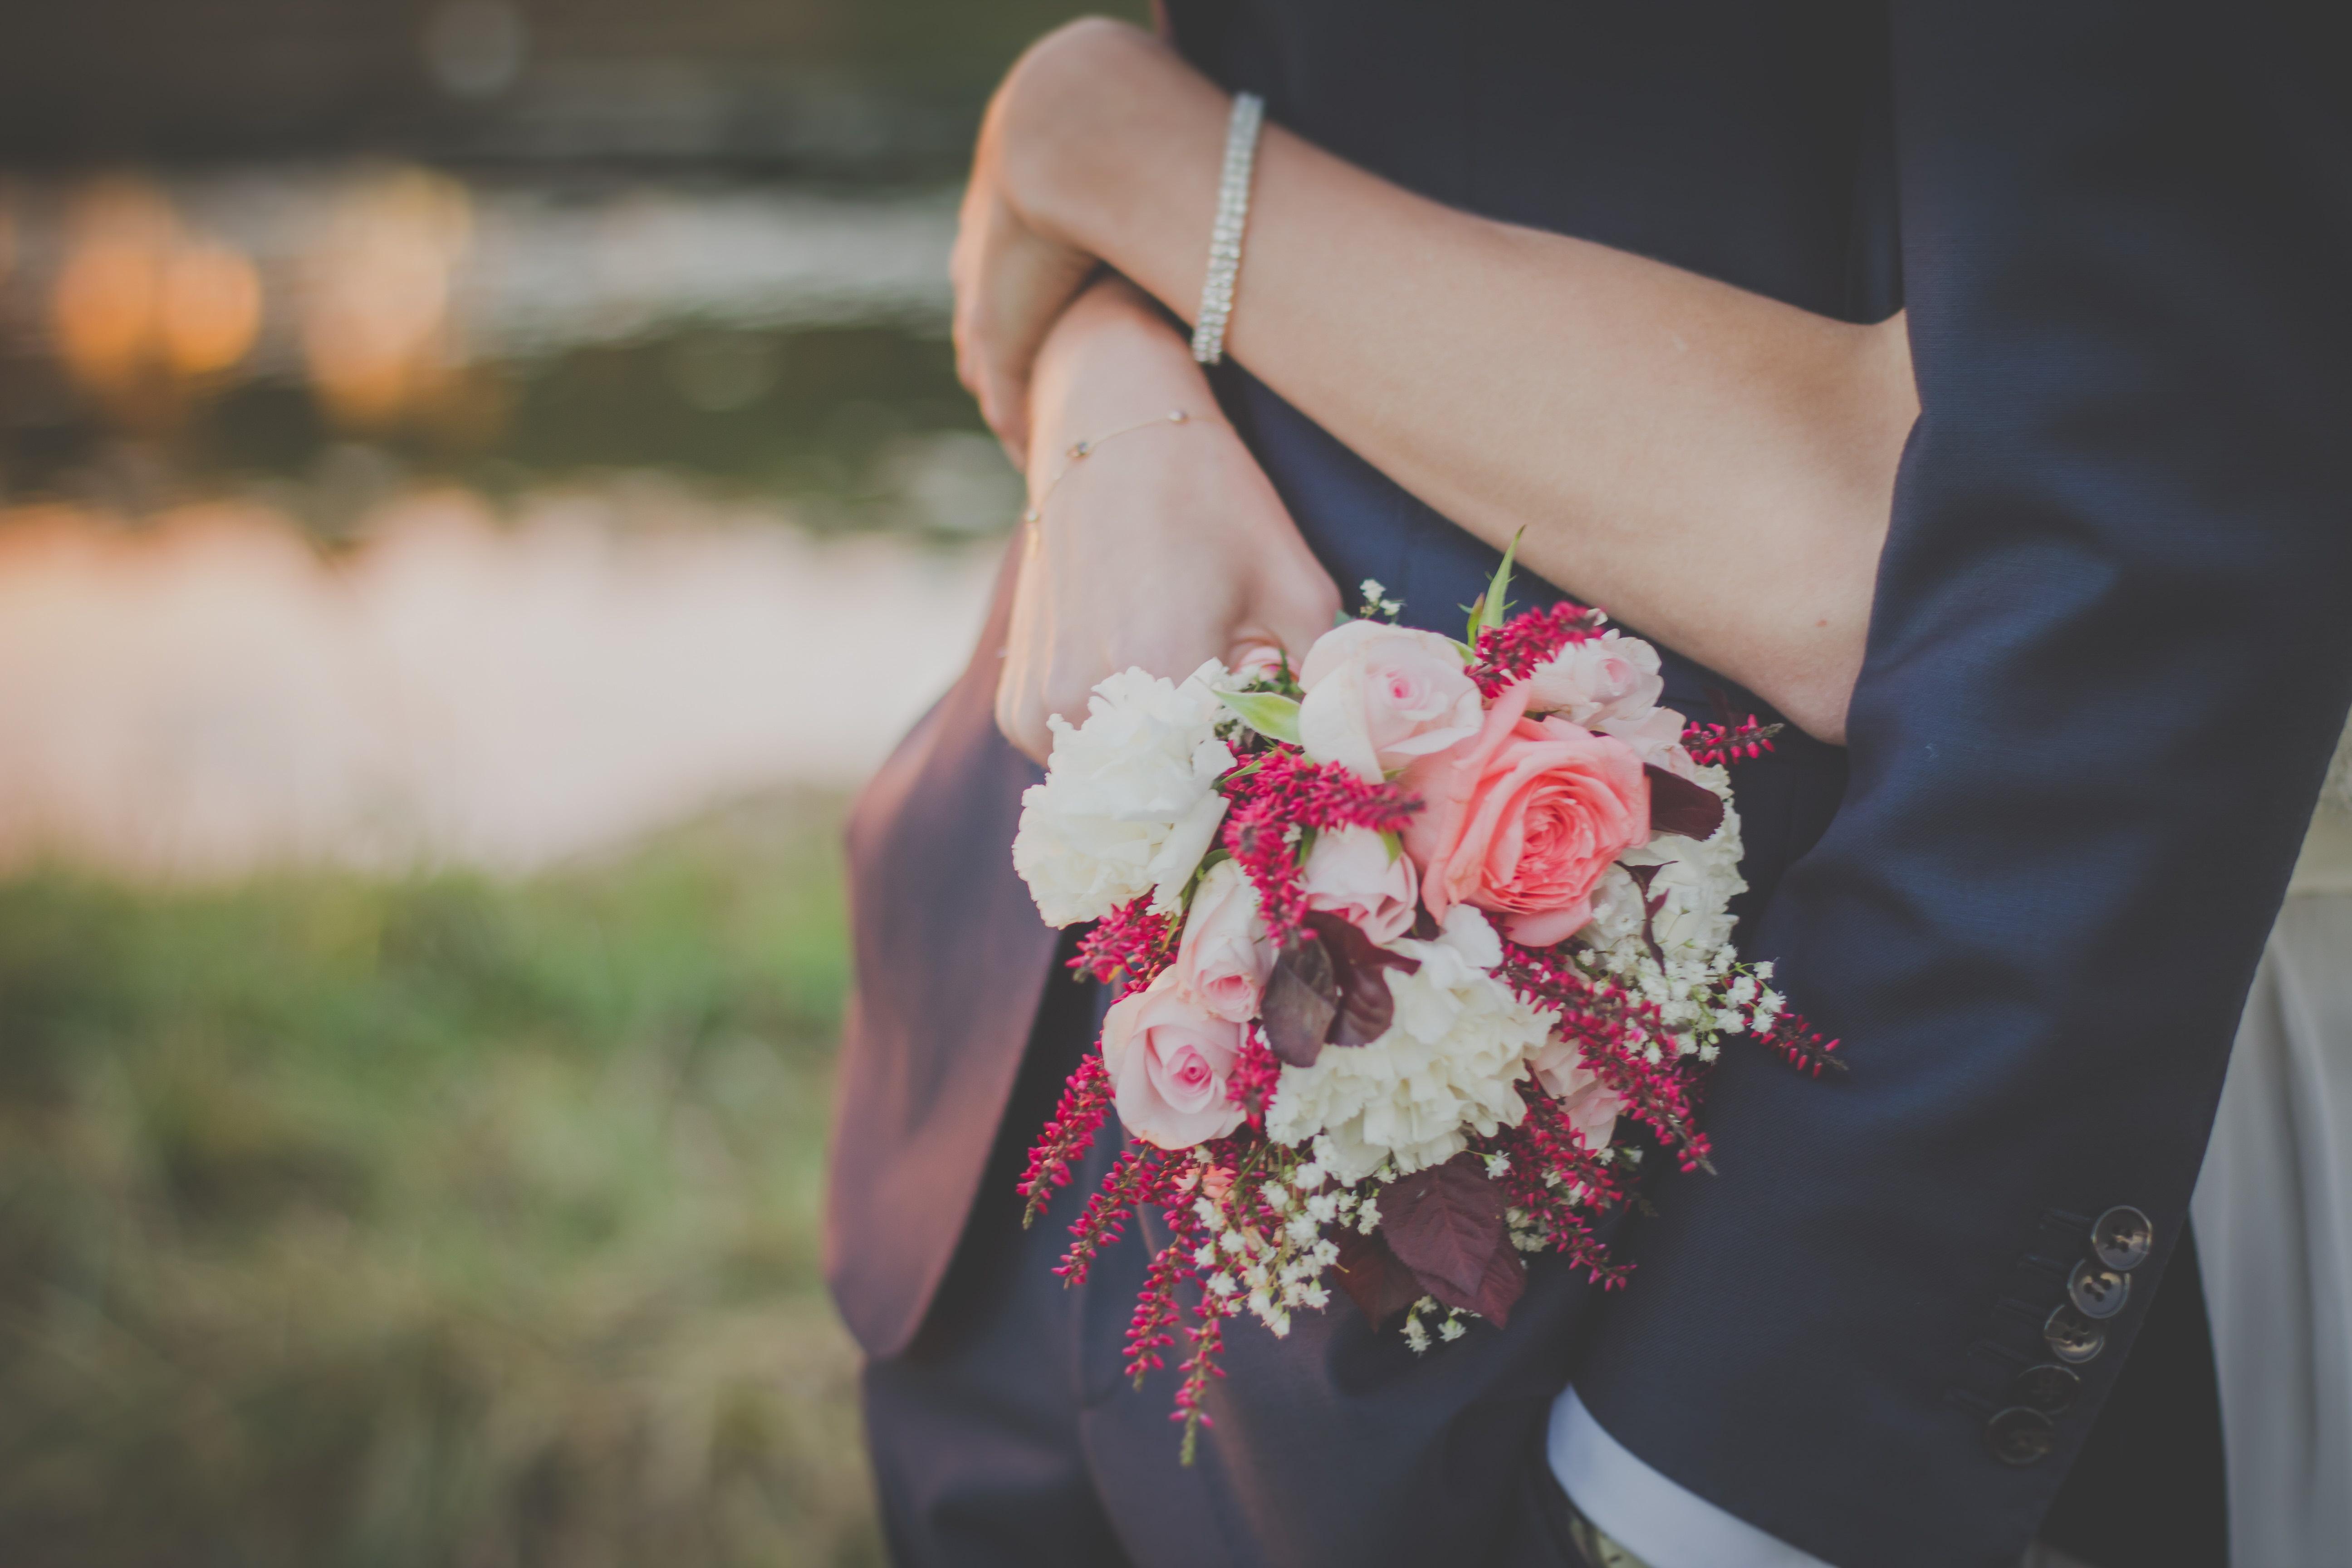 embracing newlywed couple